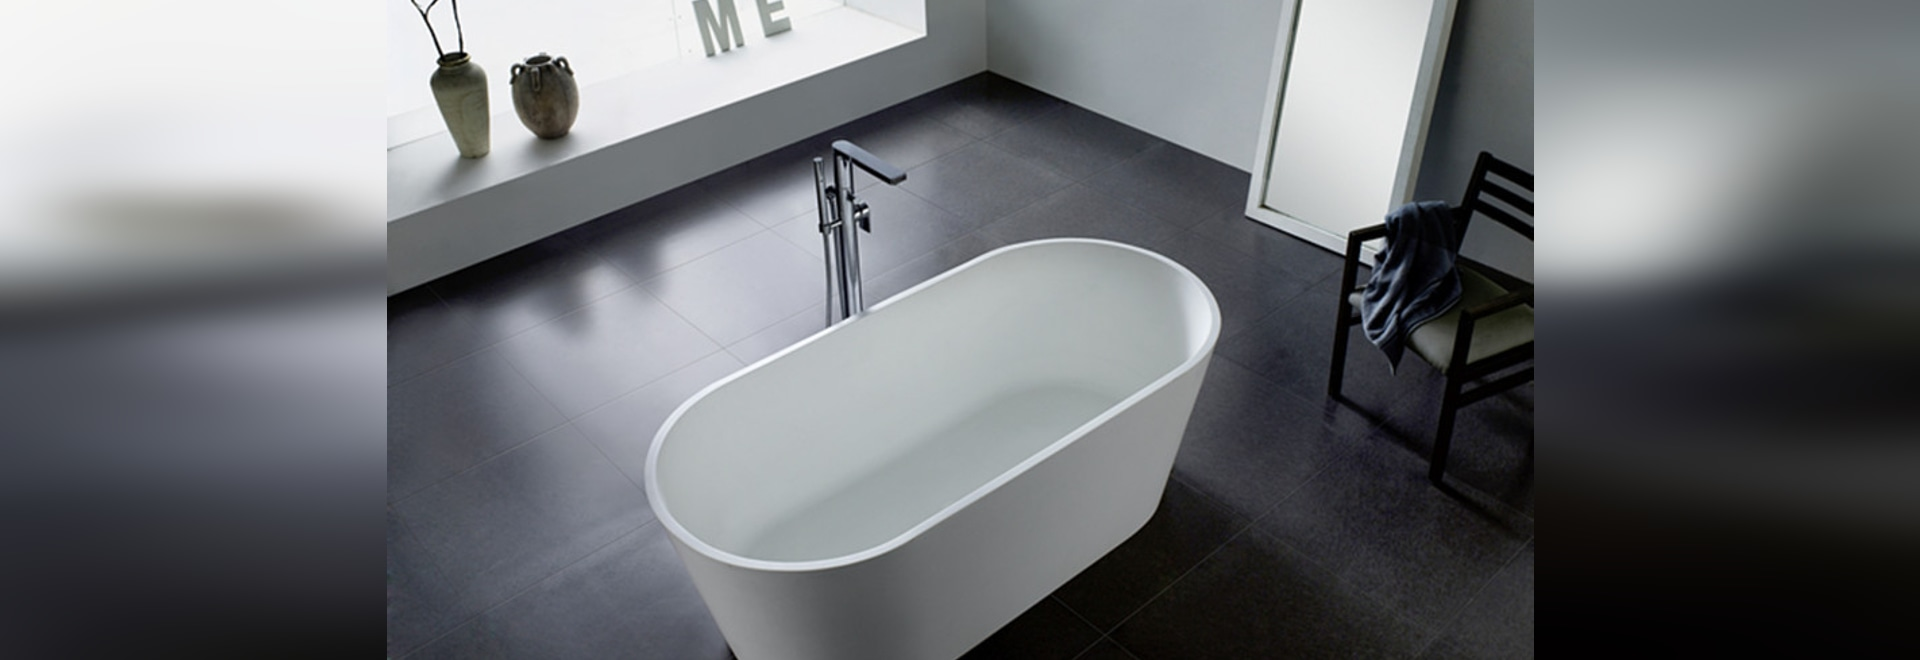 resin stone solid surface bathtub